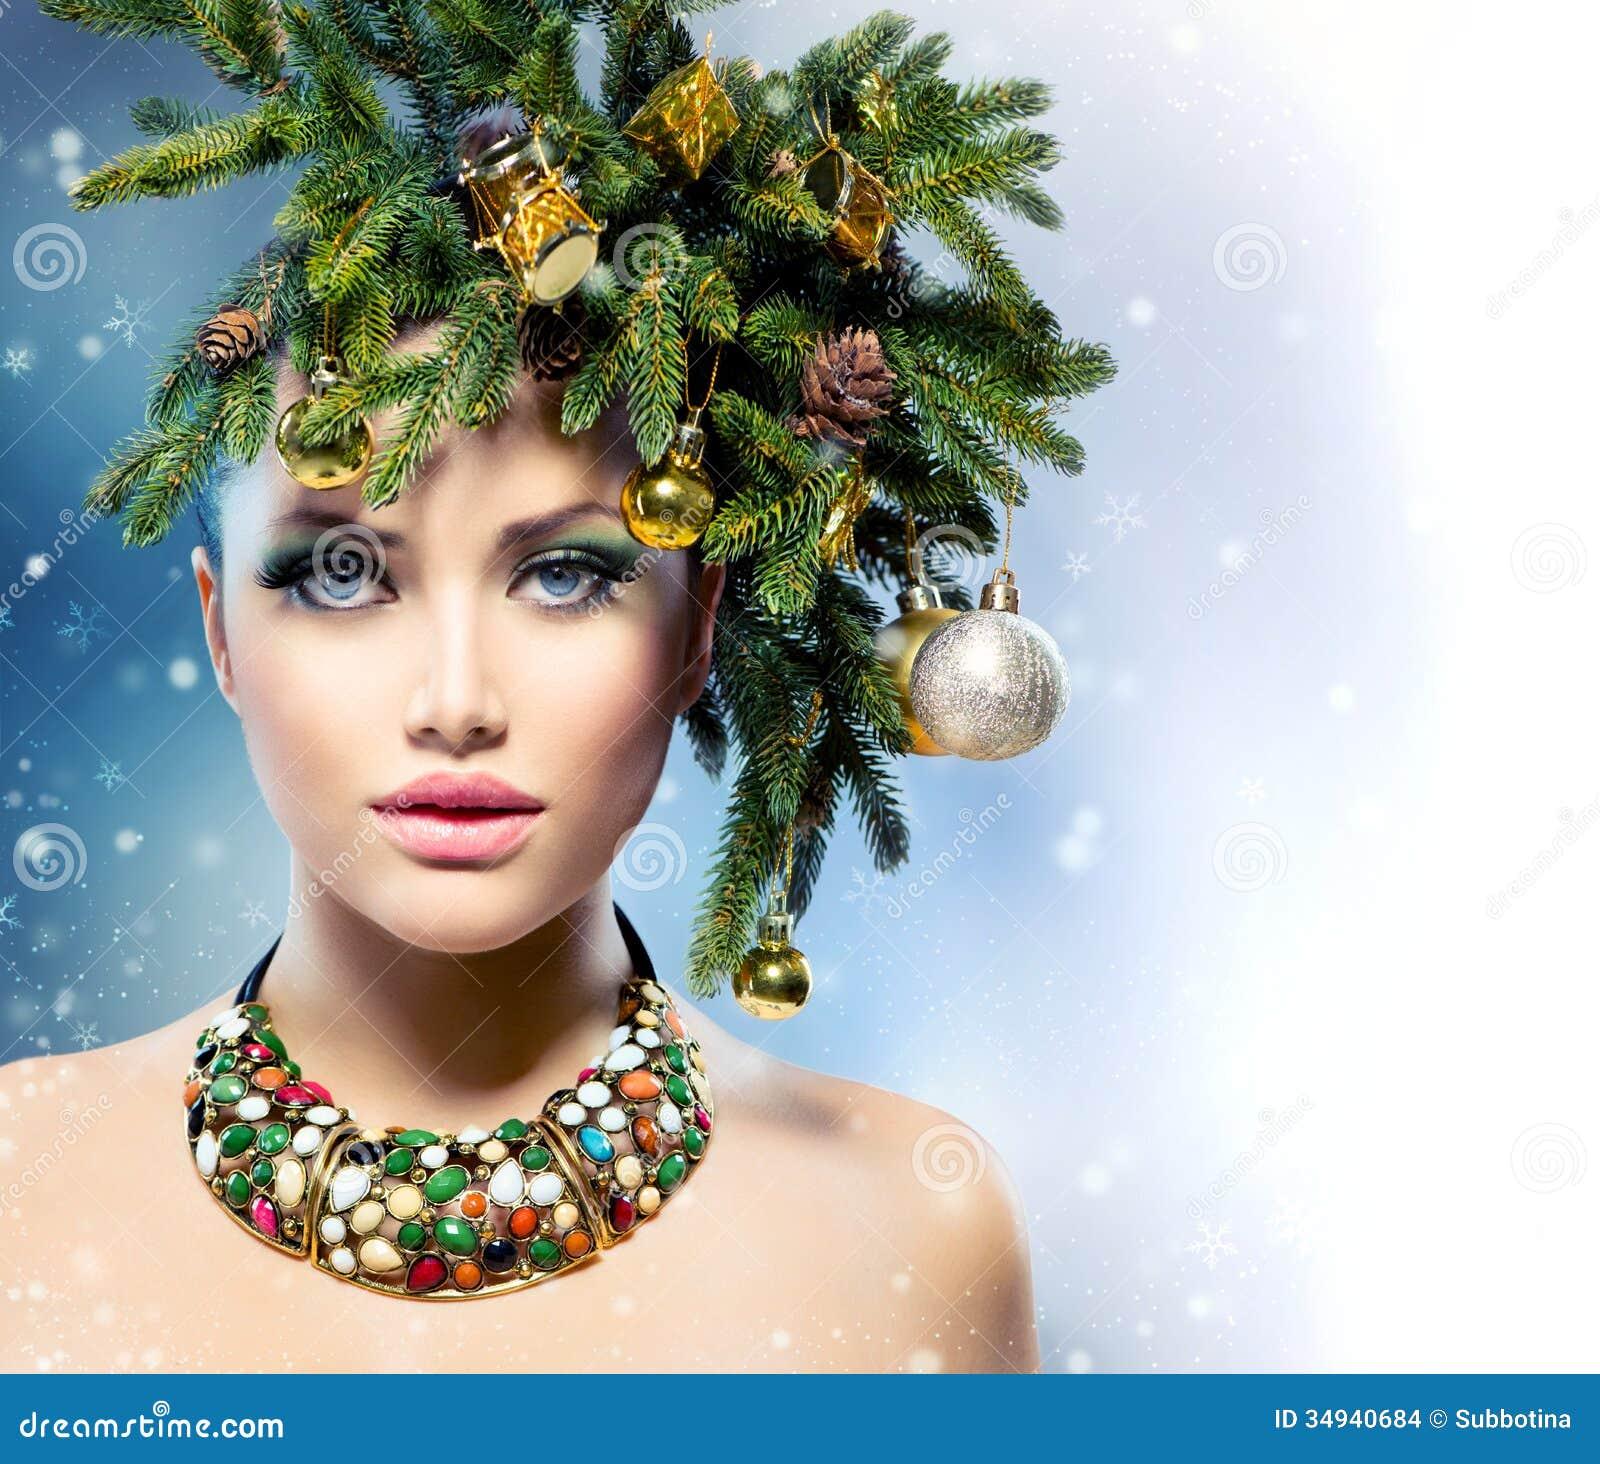 Christmas Decorations Sales